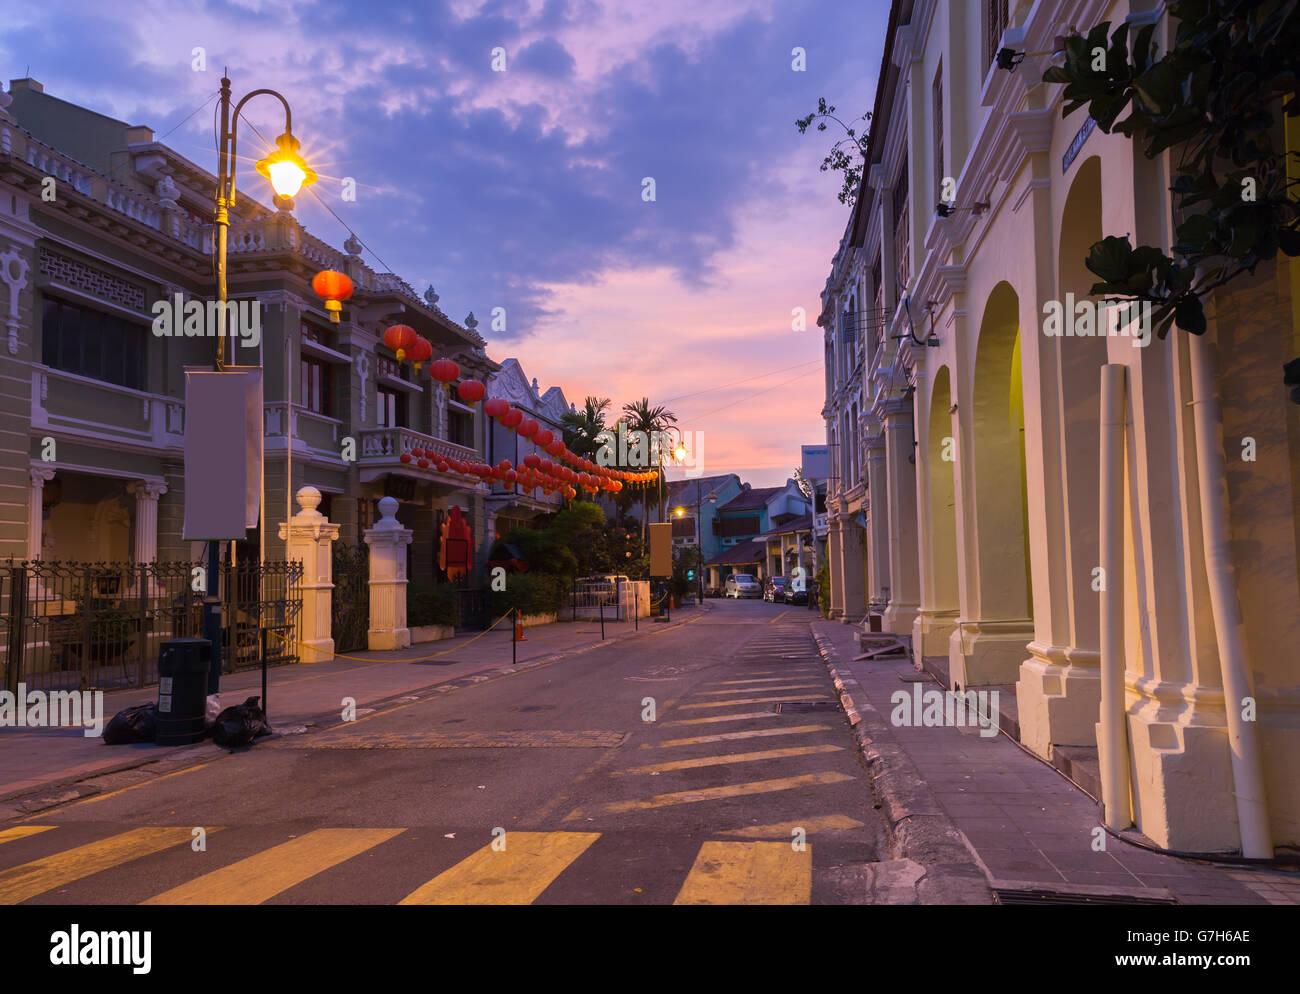 Crepuscolo vista sulla Strada Armena e Yap Kongsi clan house, George Town, Penang, Malaysia. Immagini Stock